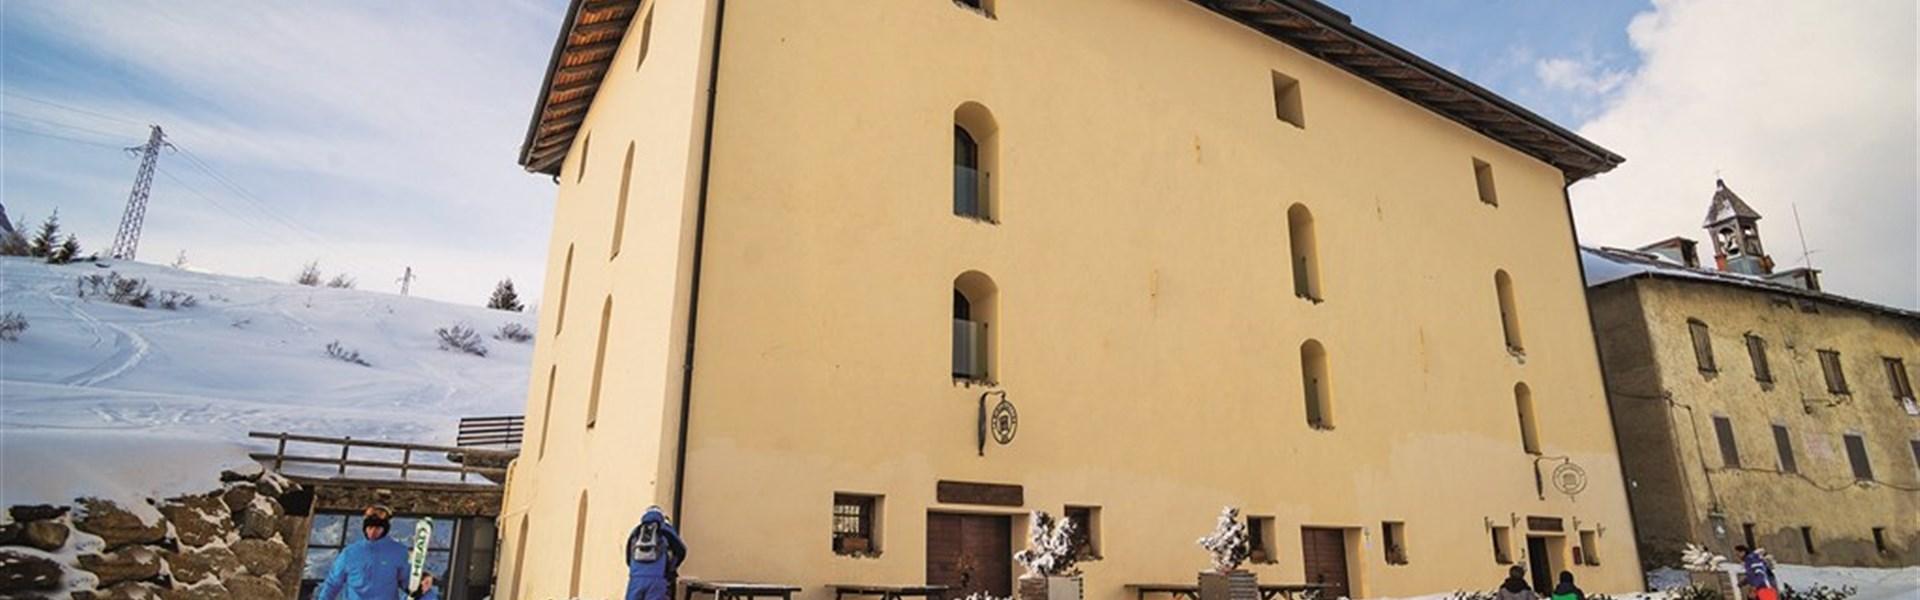 Hotel Dimora Storica La Mirandola -